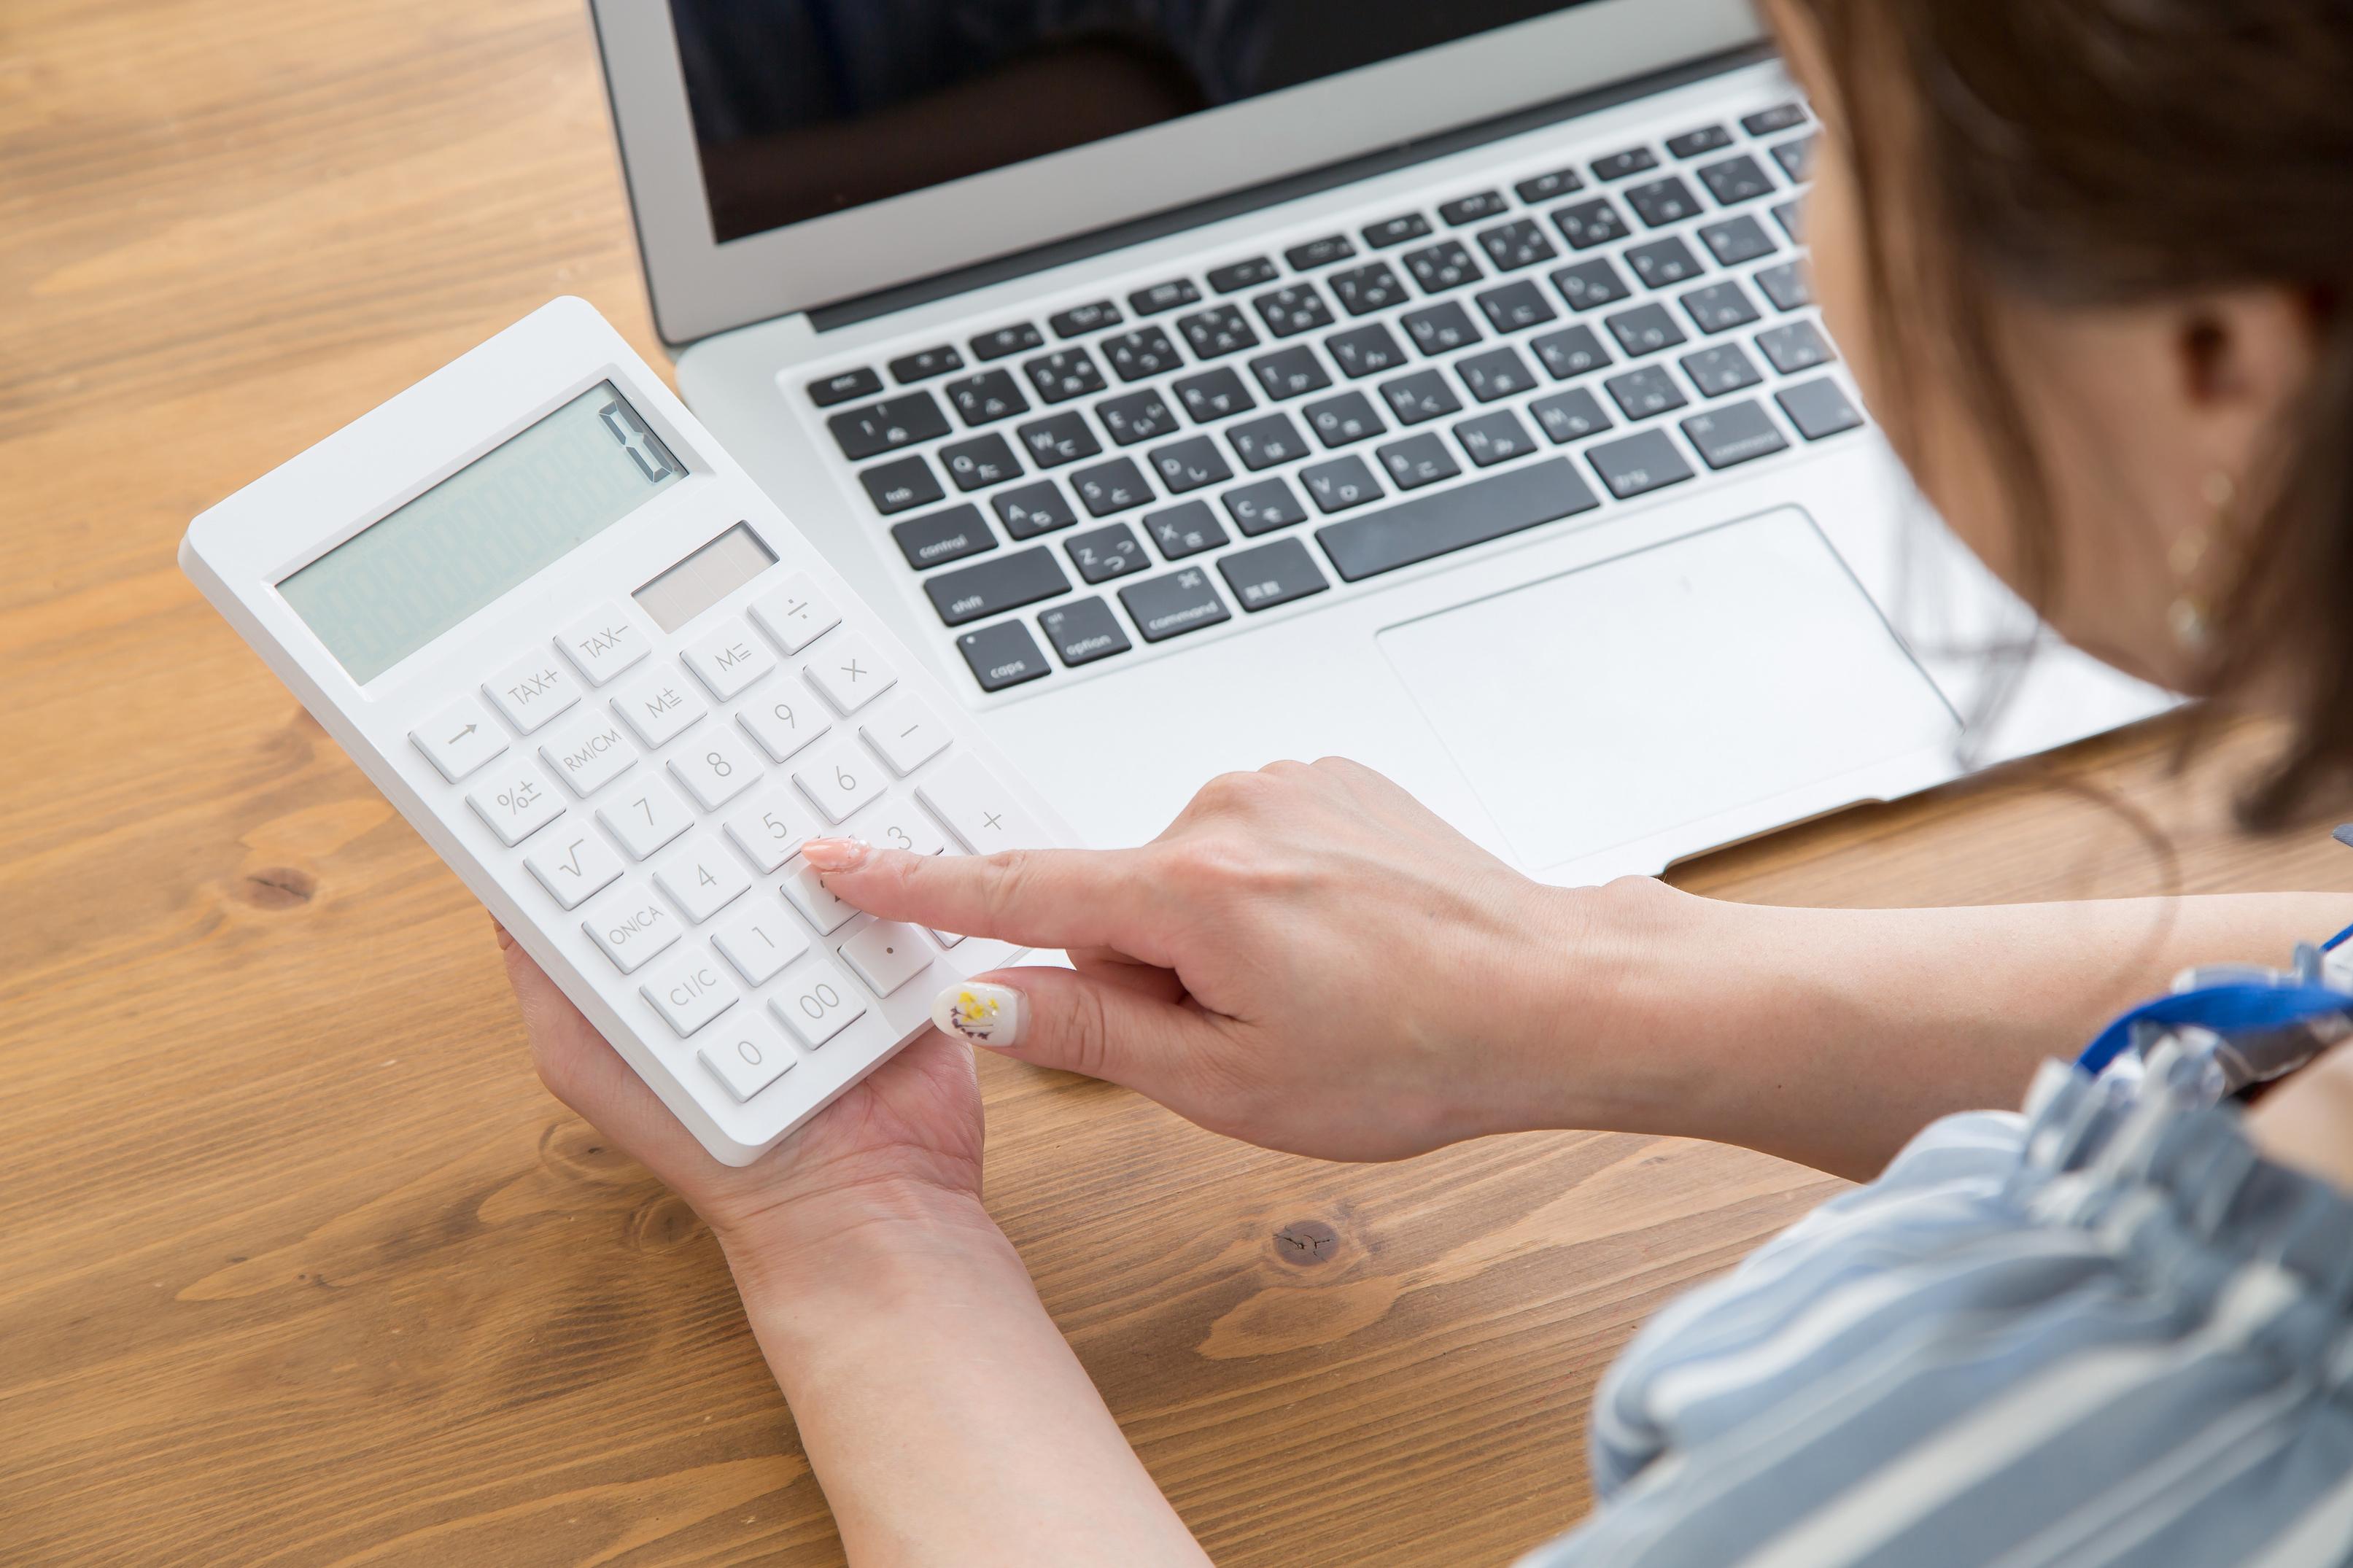 SNS運用代行の料金を計算する女性